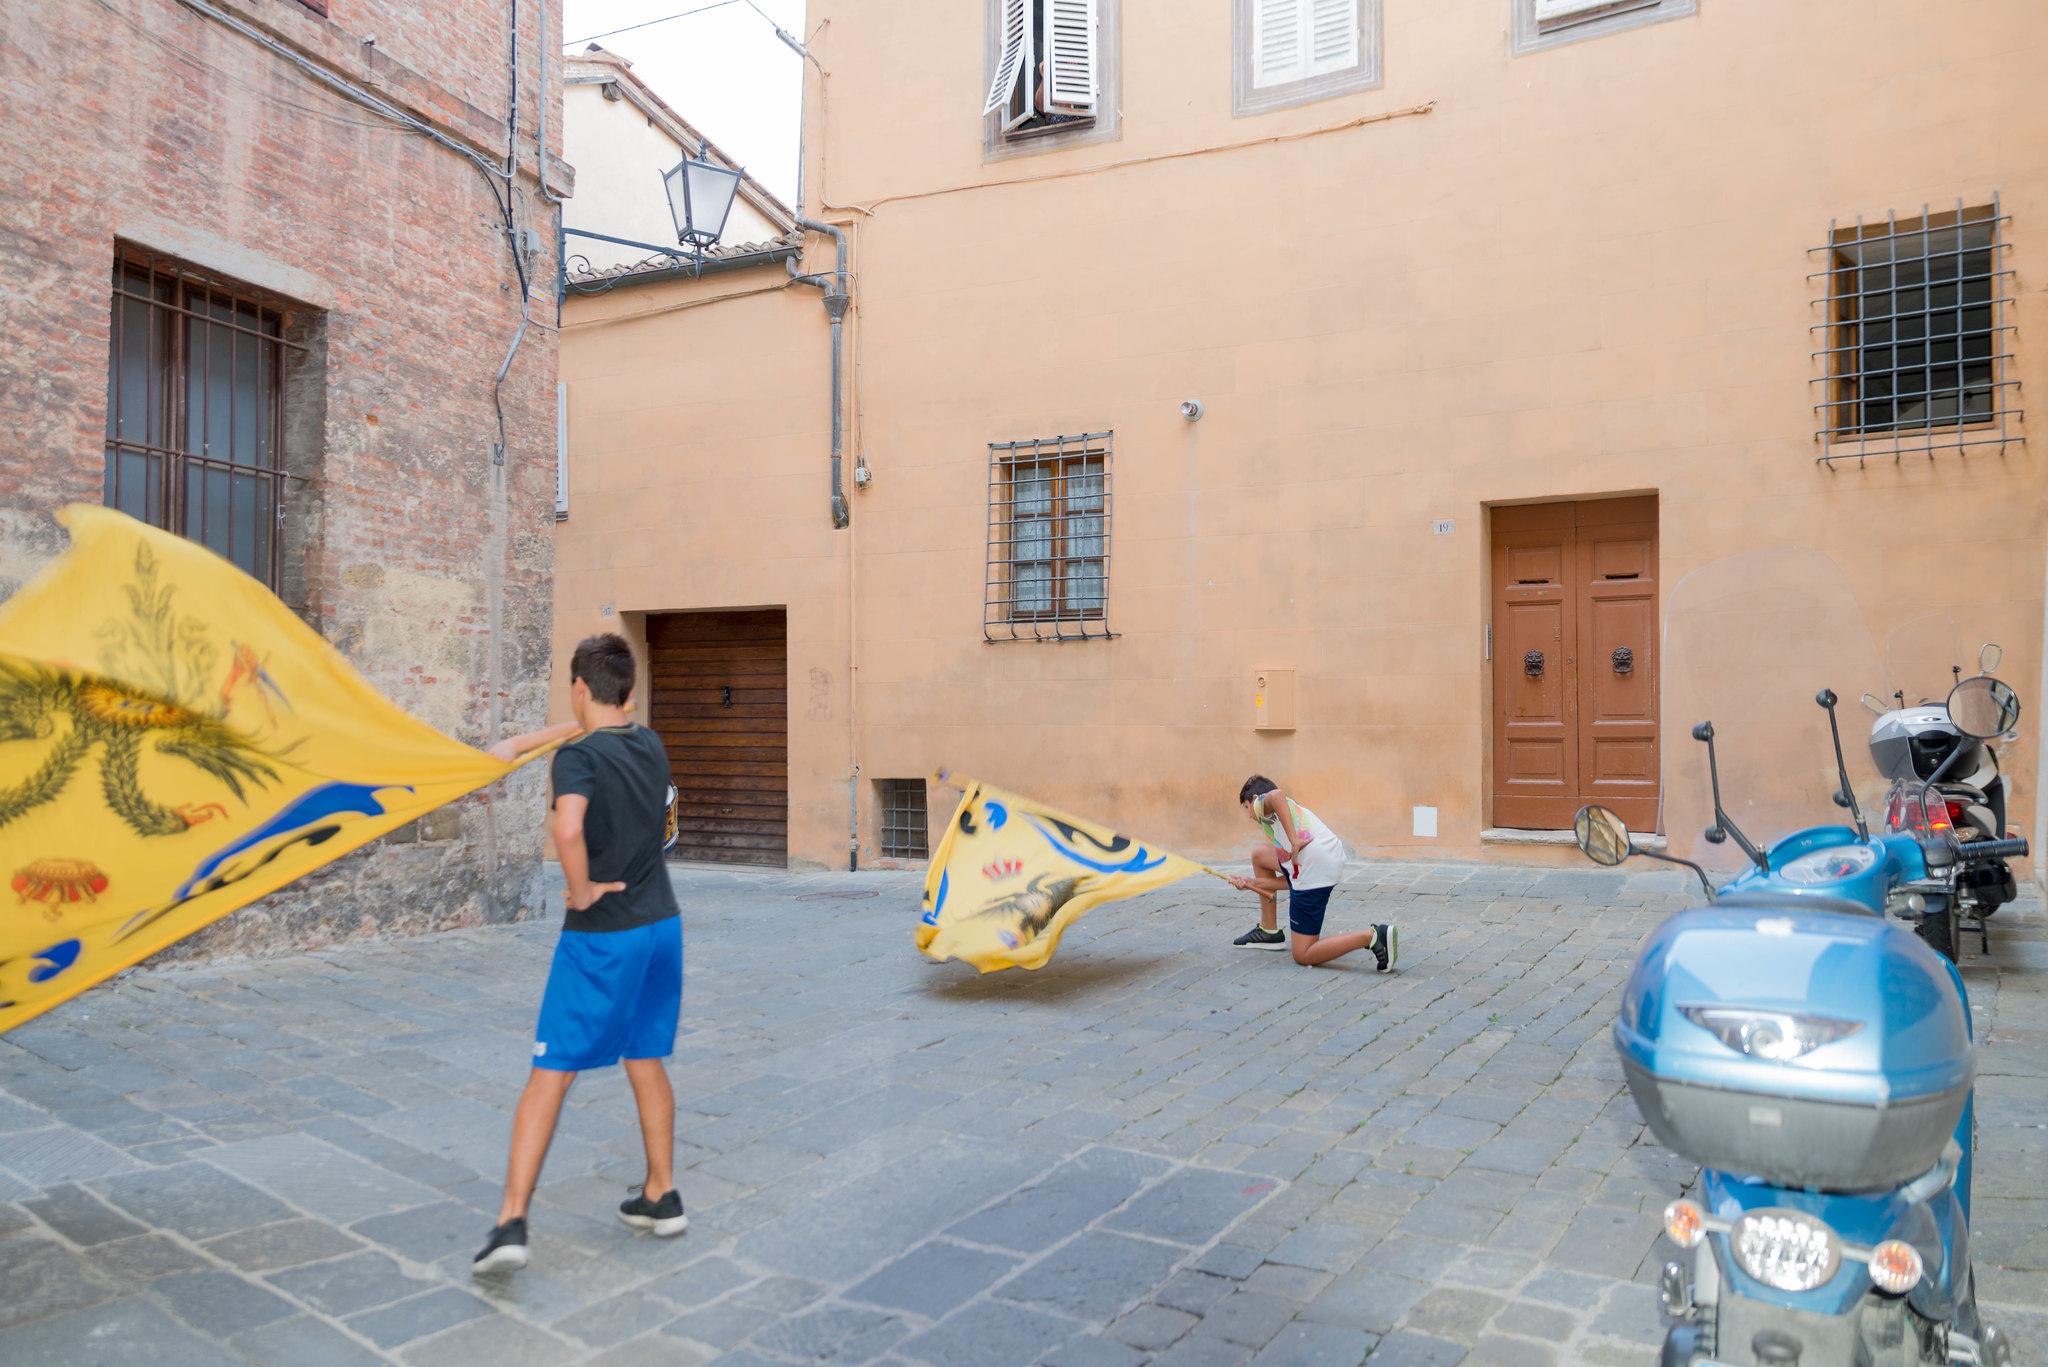 Siena children practicing flag tossing